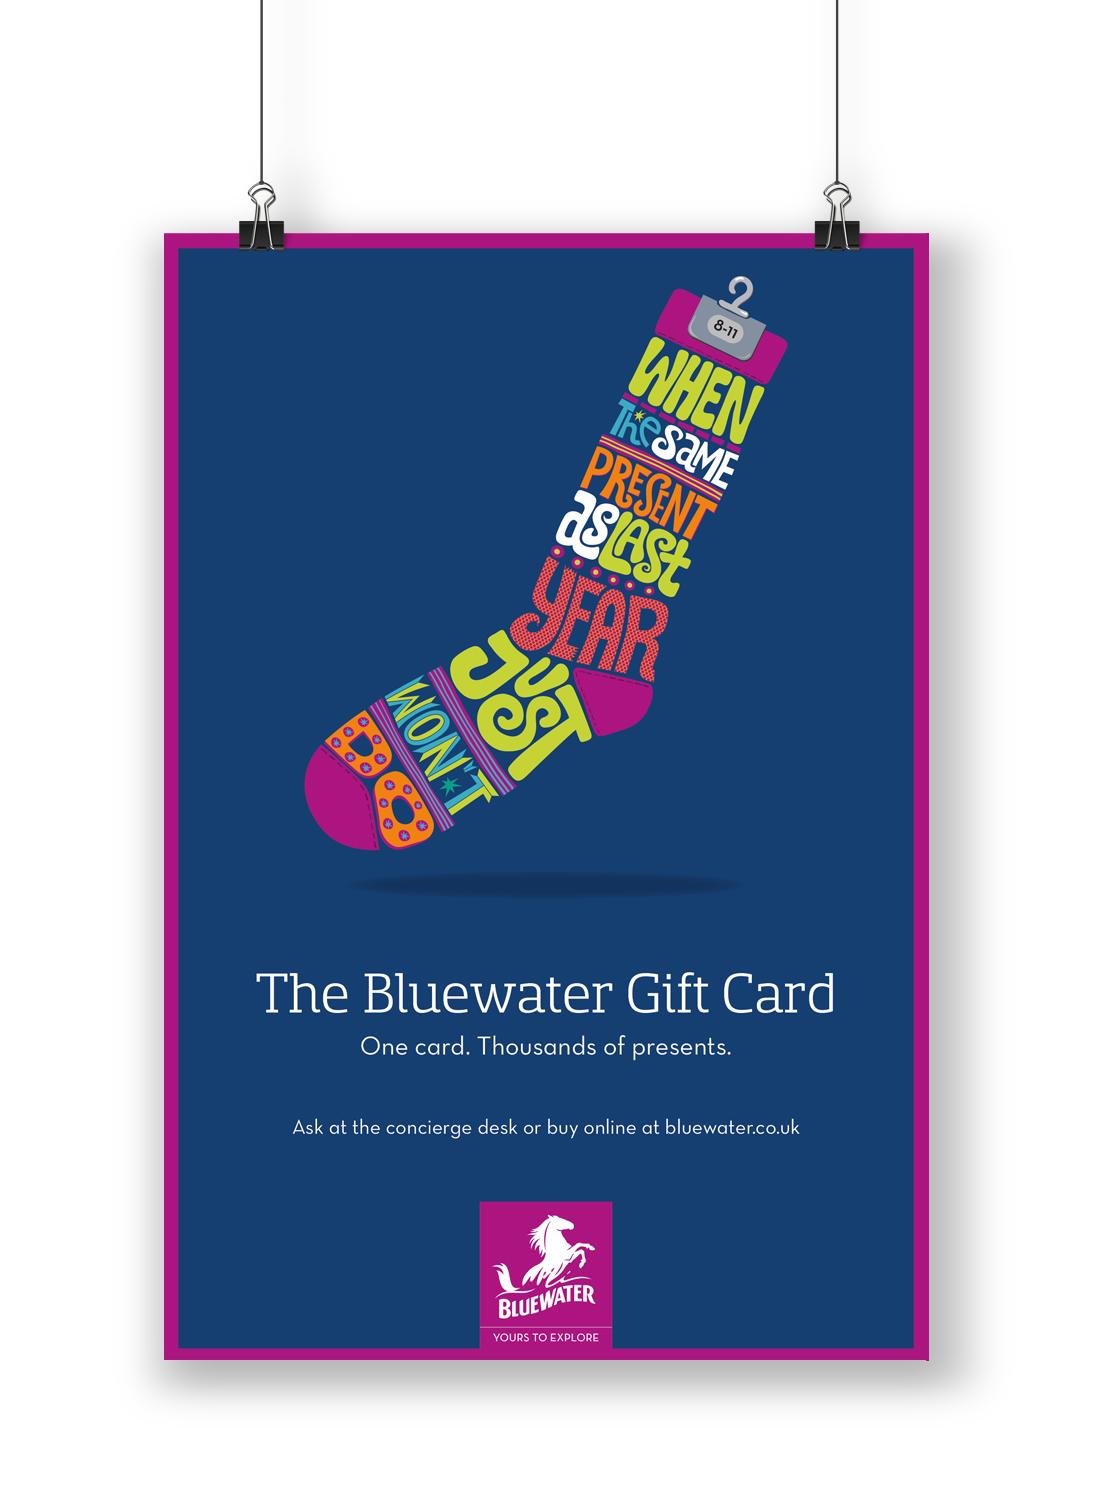 GiftcardPosterMockup1.jpg